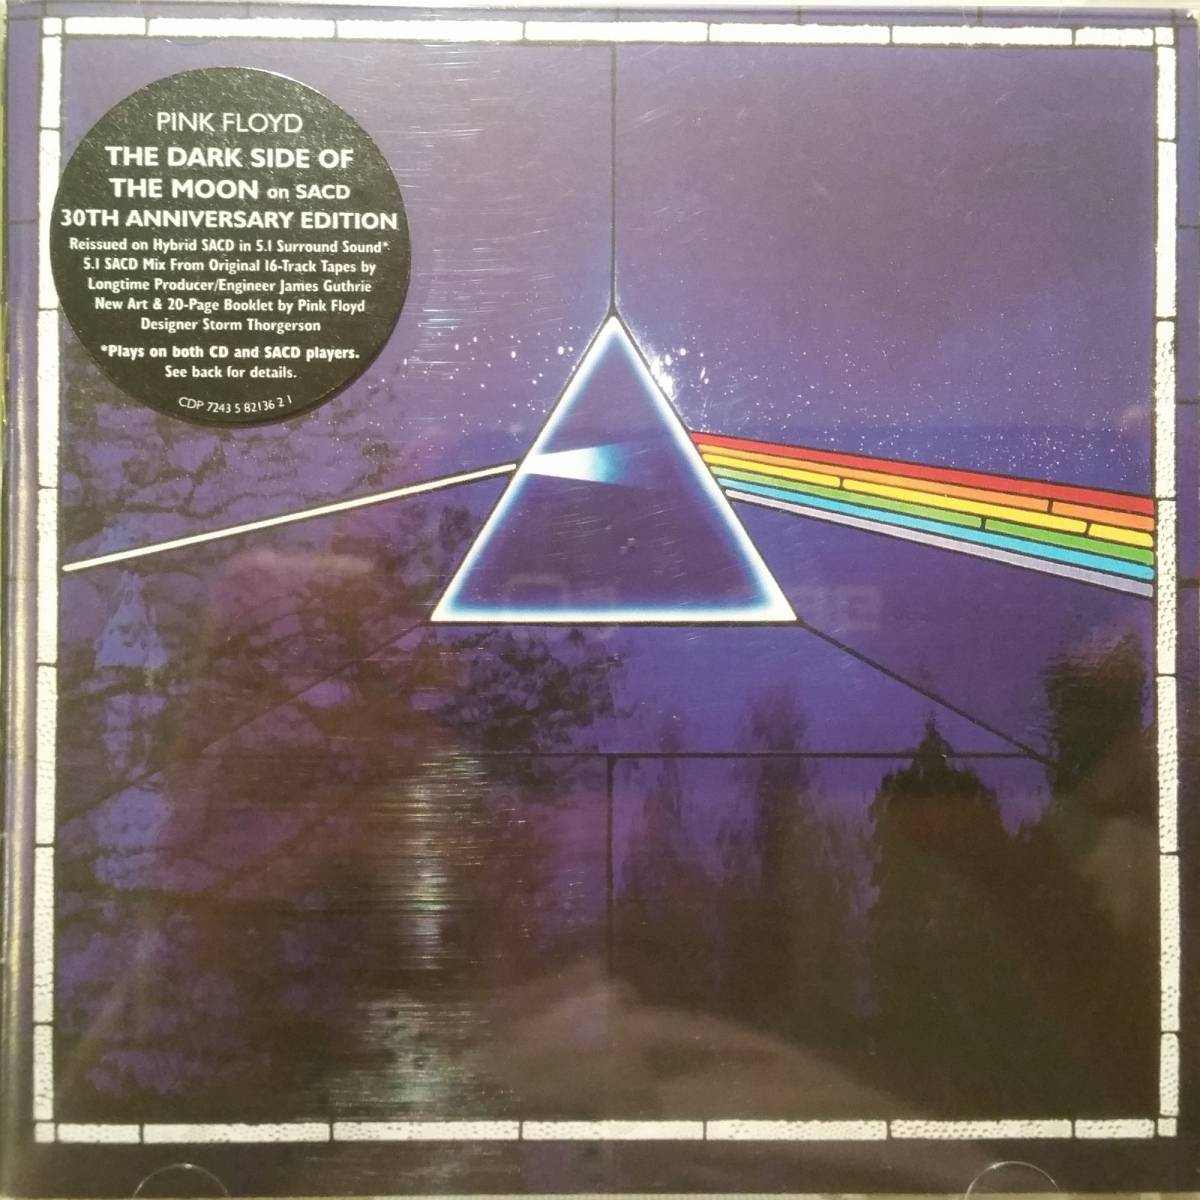 Pink Floyd: The Dark Side Of The Moon - SACD (2003, Re